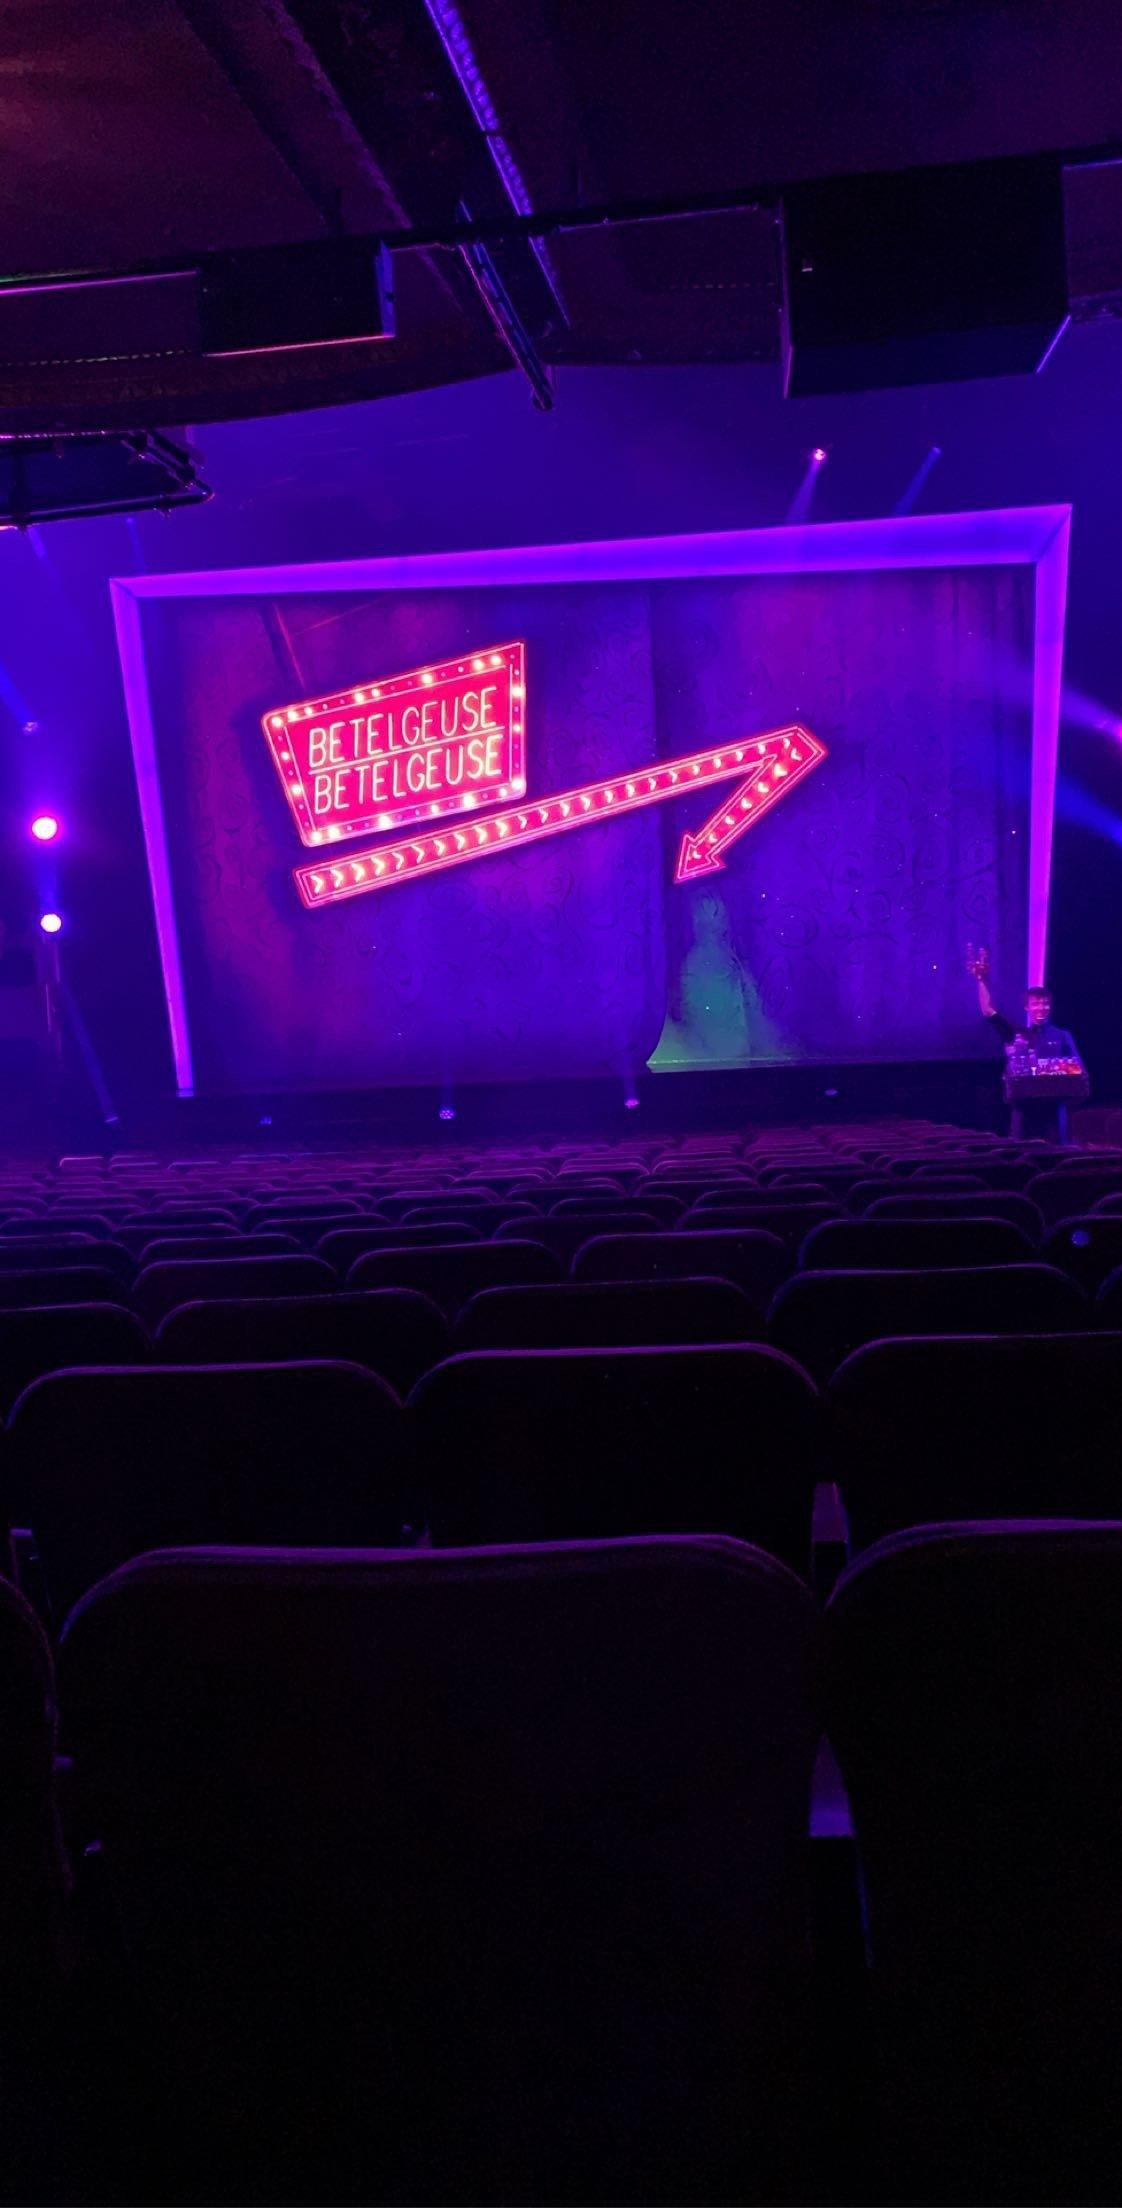 Winter Garden Theatre Section Orchestra C Row U Seat 104